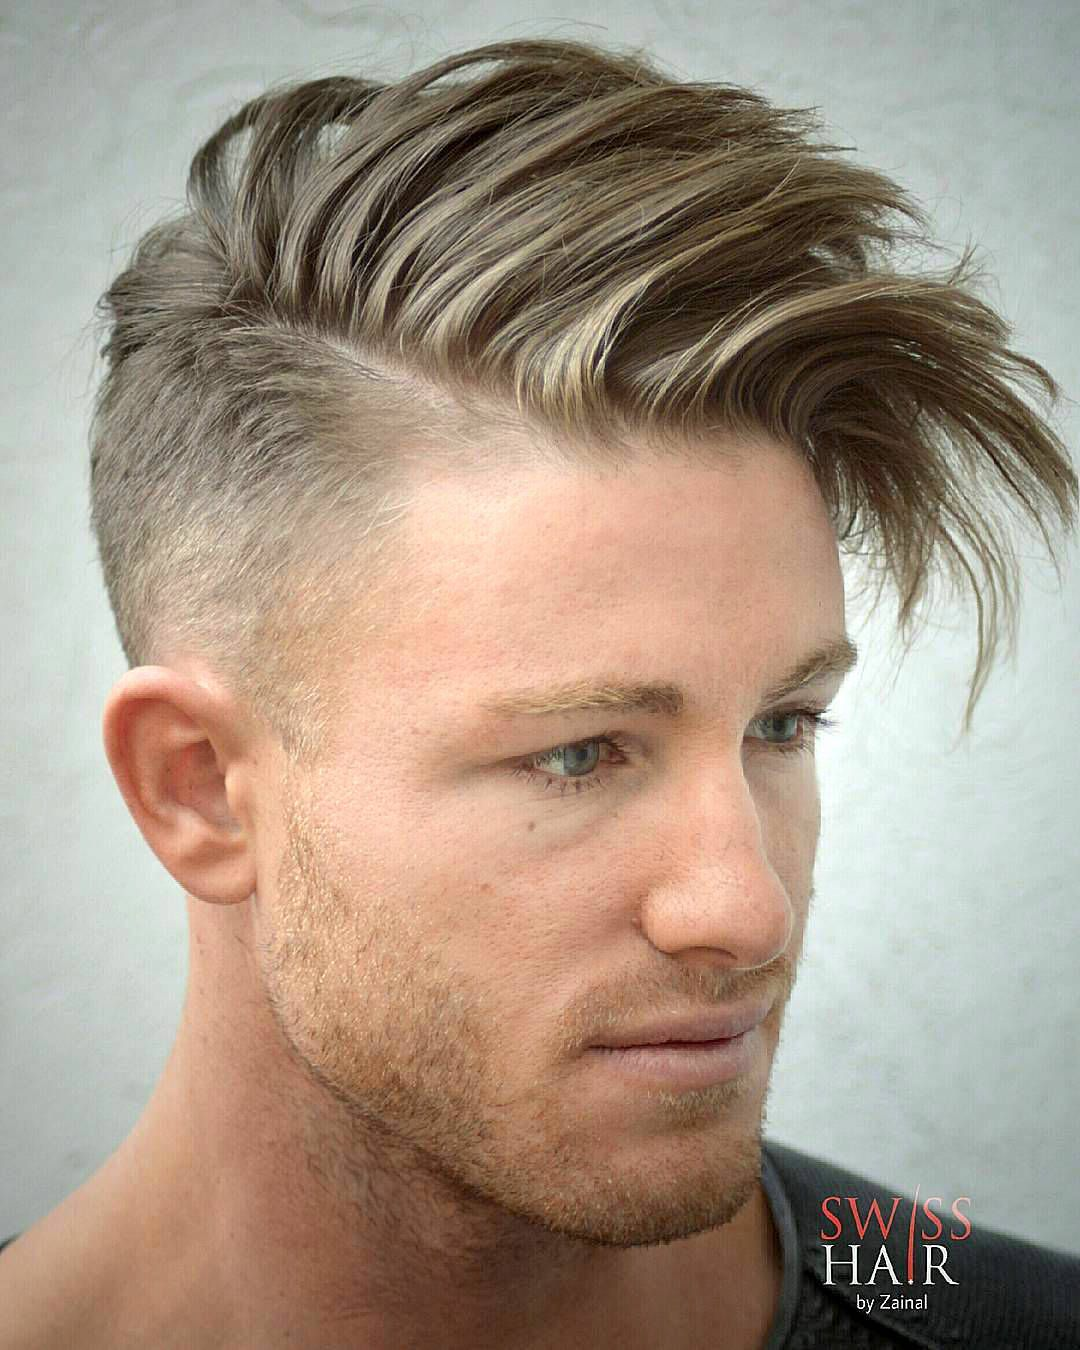 Long Hair Hairstyles For Men 20 Cool Haircut Styles For 2020 Long Hair On Top Long Hair Styles Men Mens Hairstyles Short